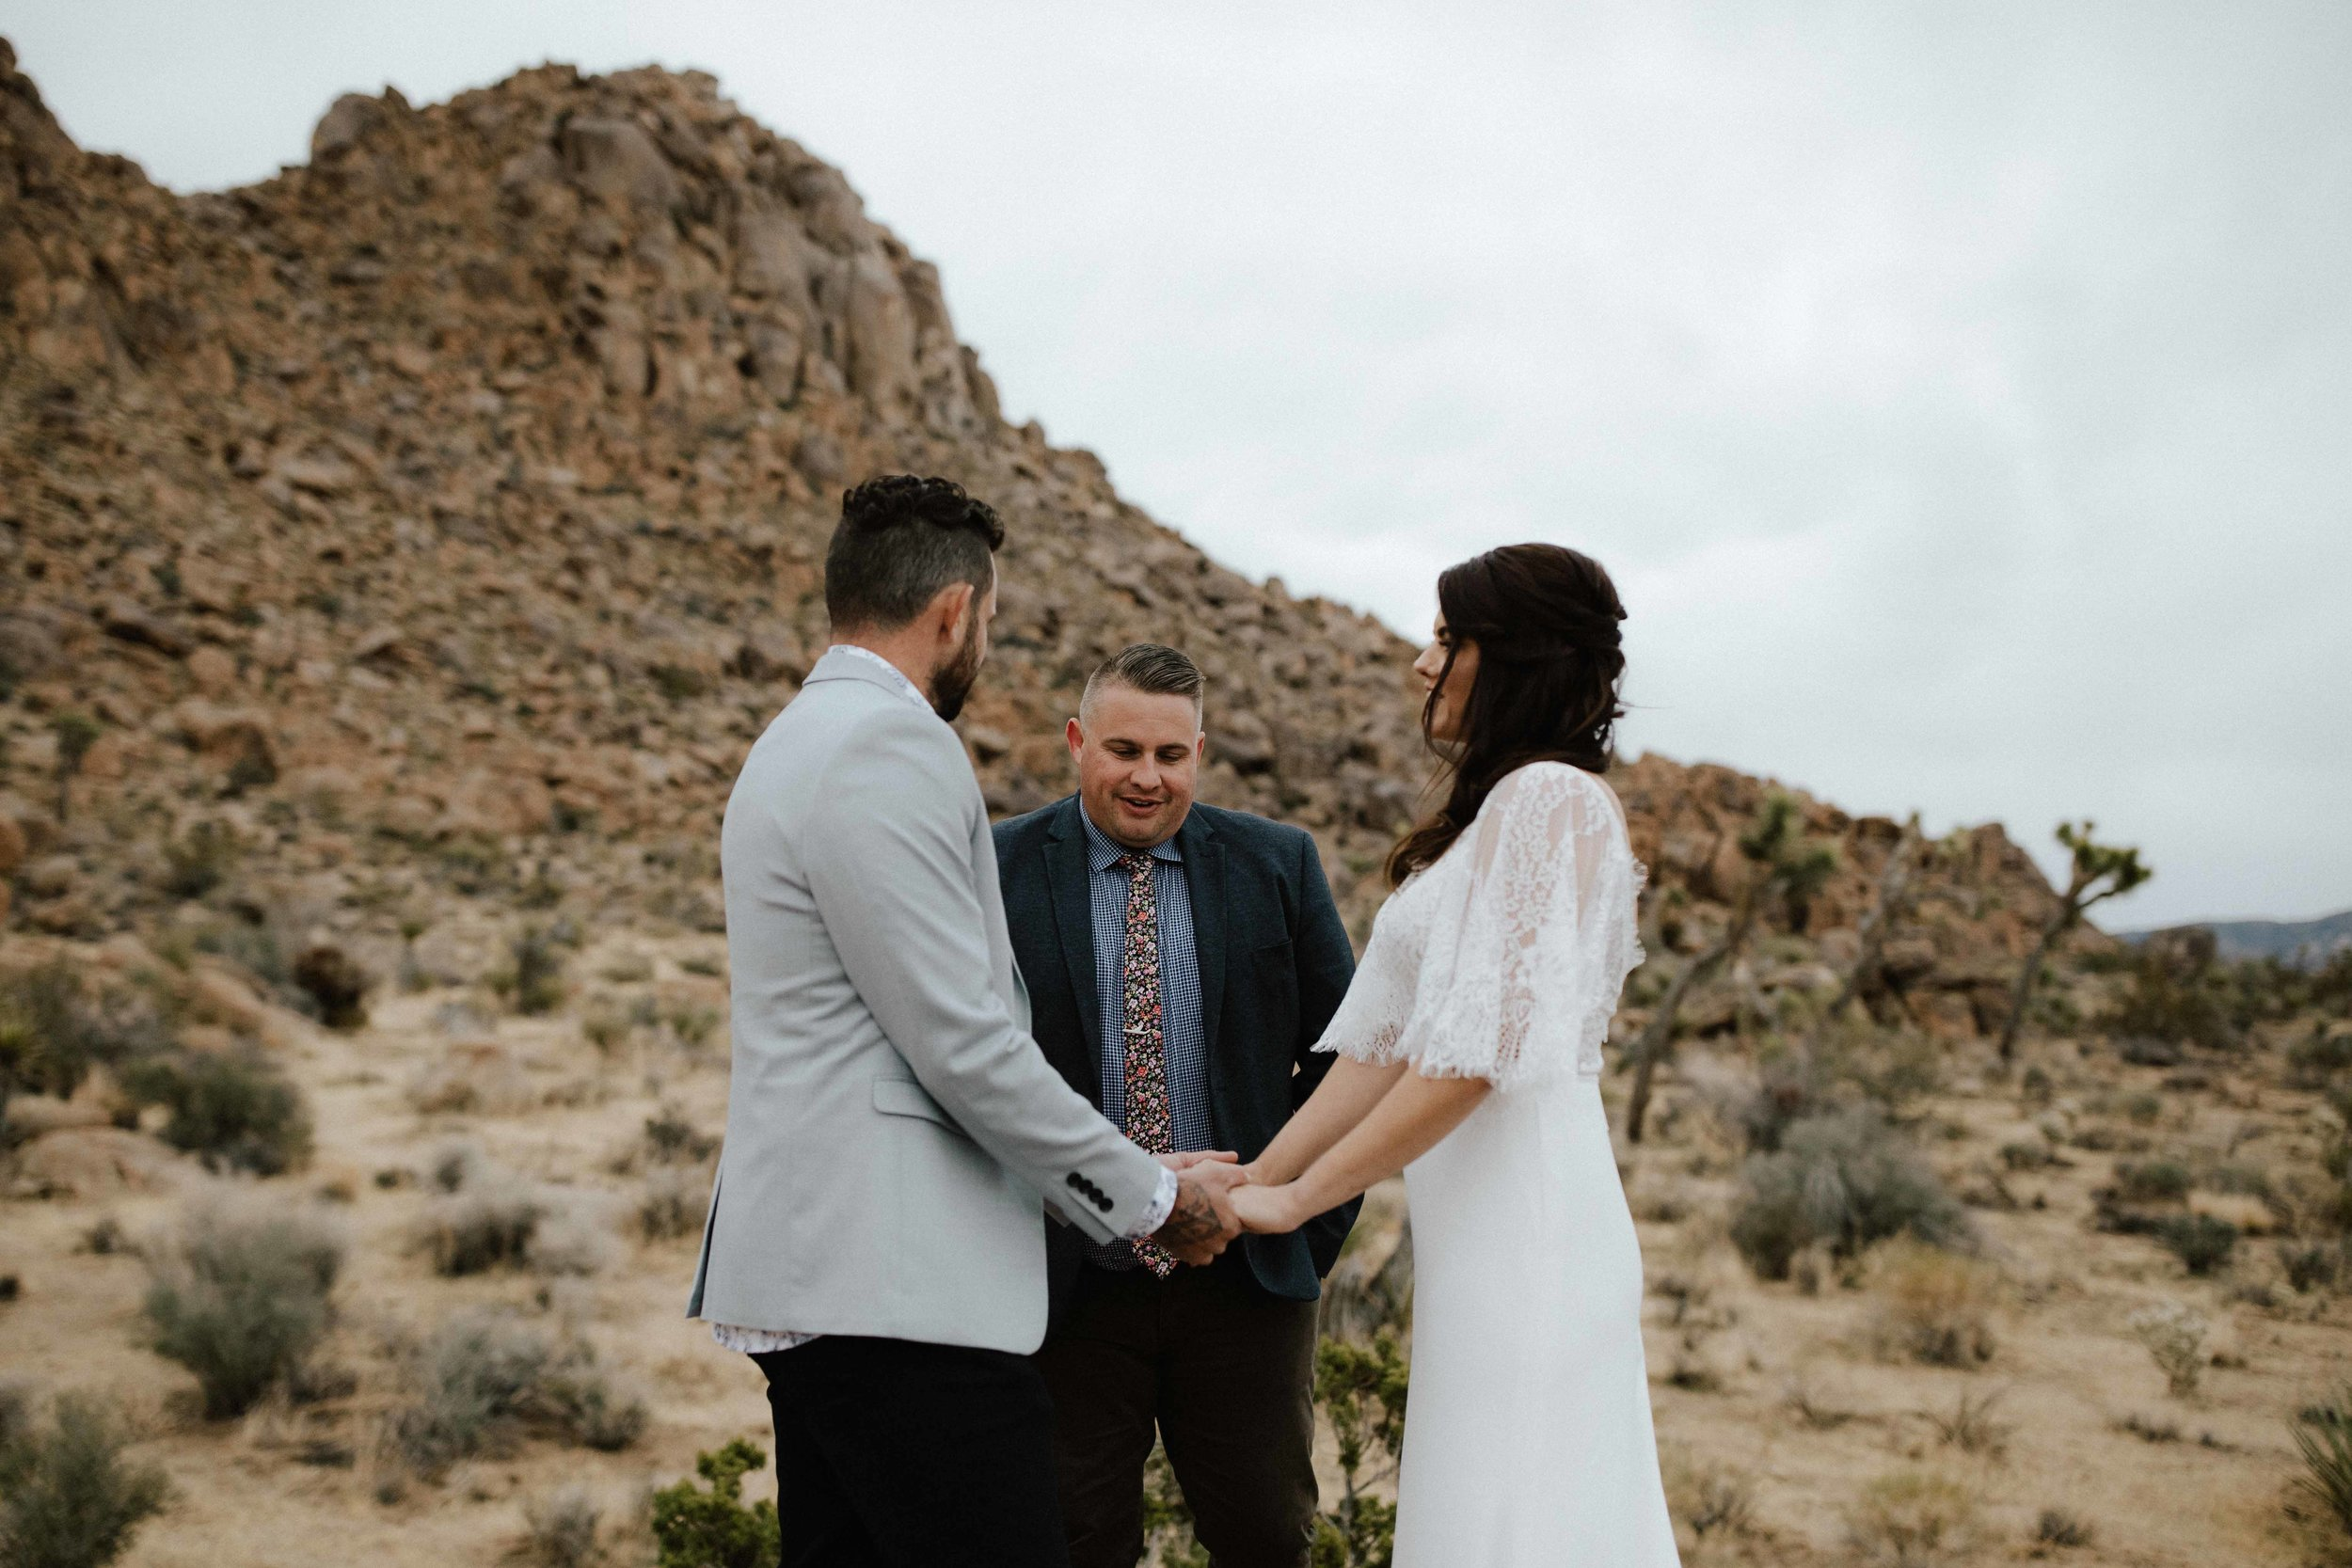 America Joshua Tree Palm Springs Elopement wedding-26.jpg